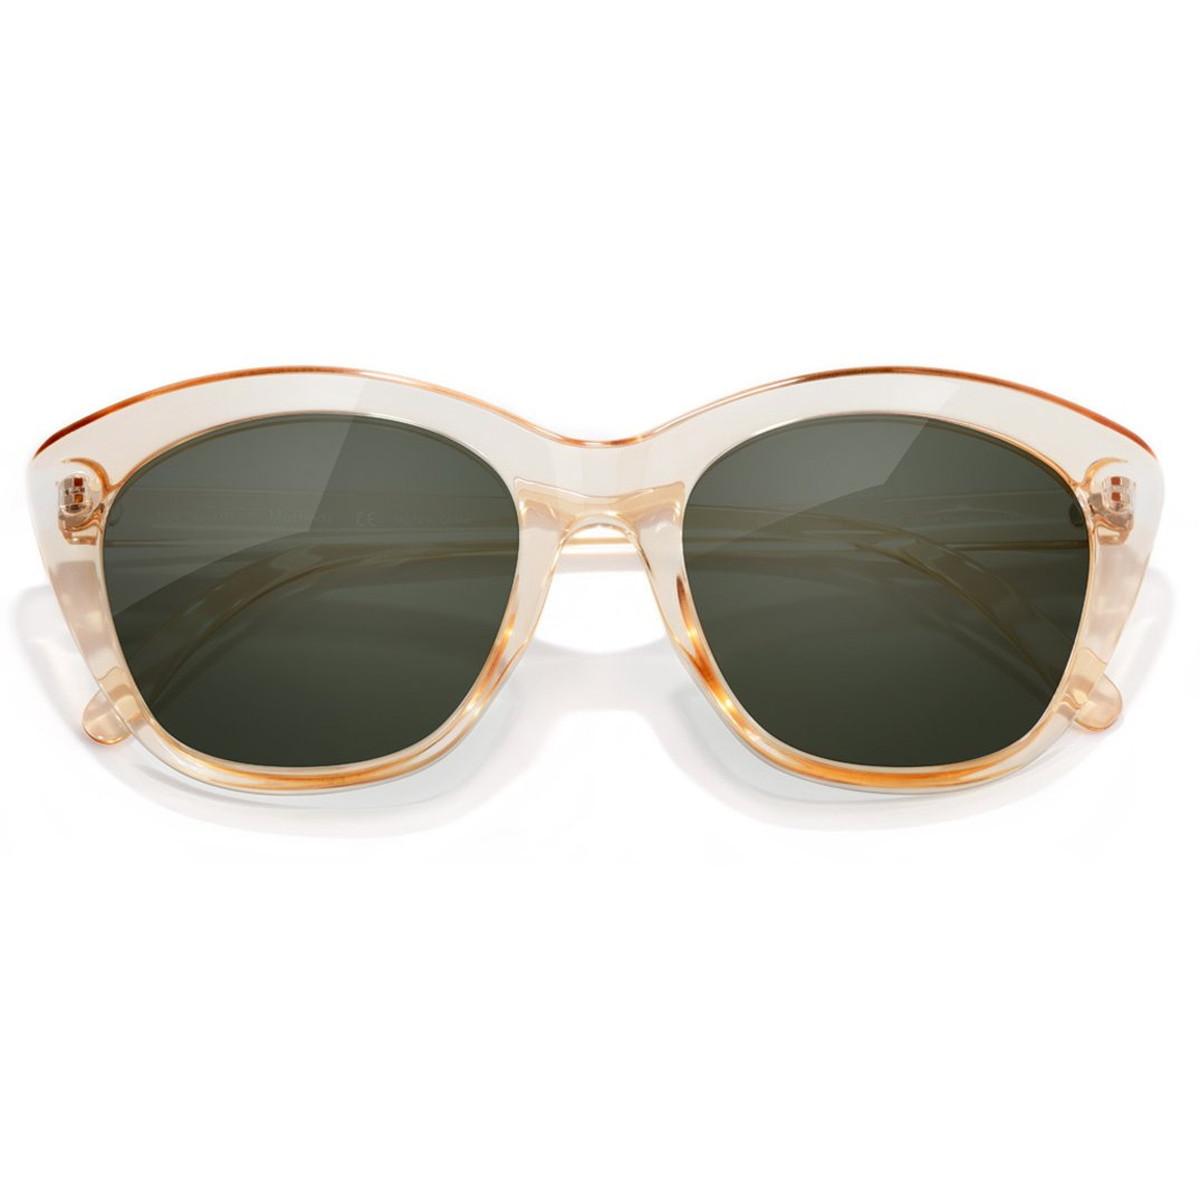 SUNSKI サンスキー Mattina Champagne Forest 眼鏡 サングラス